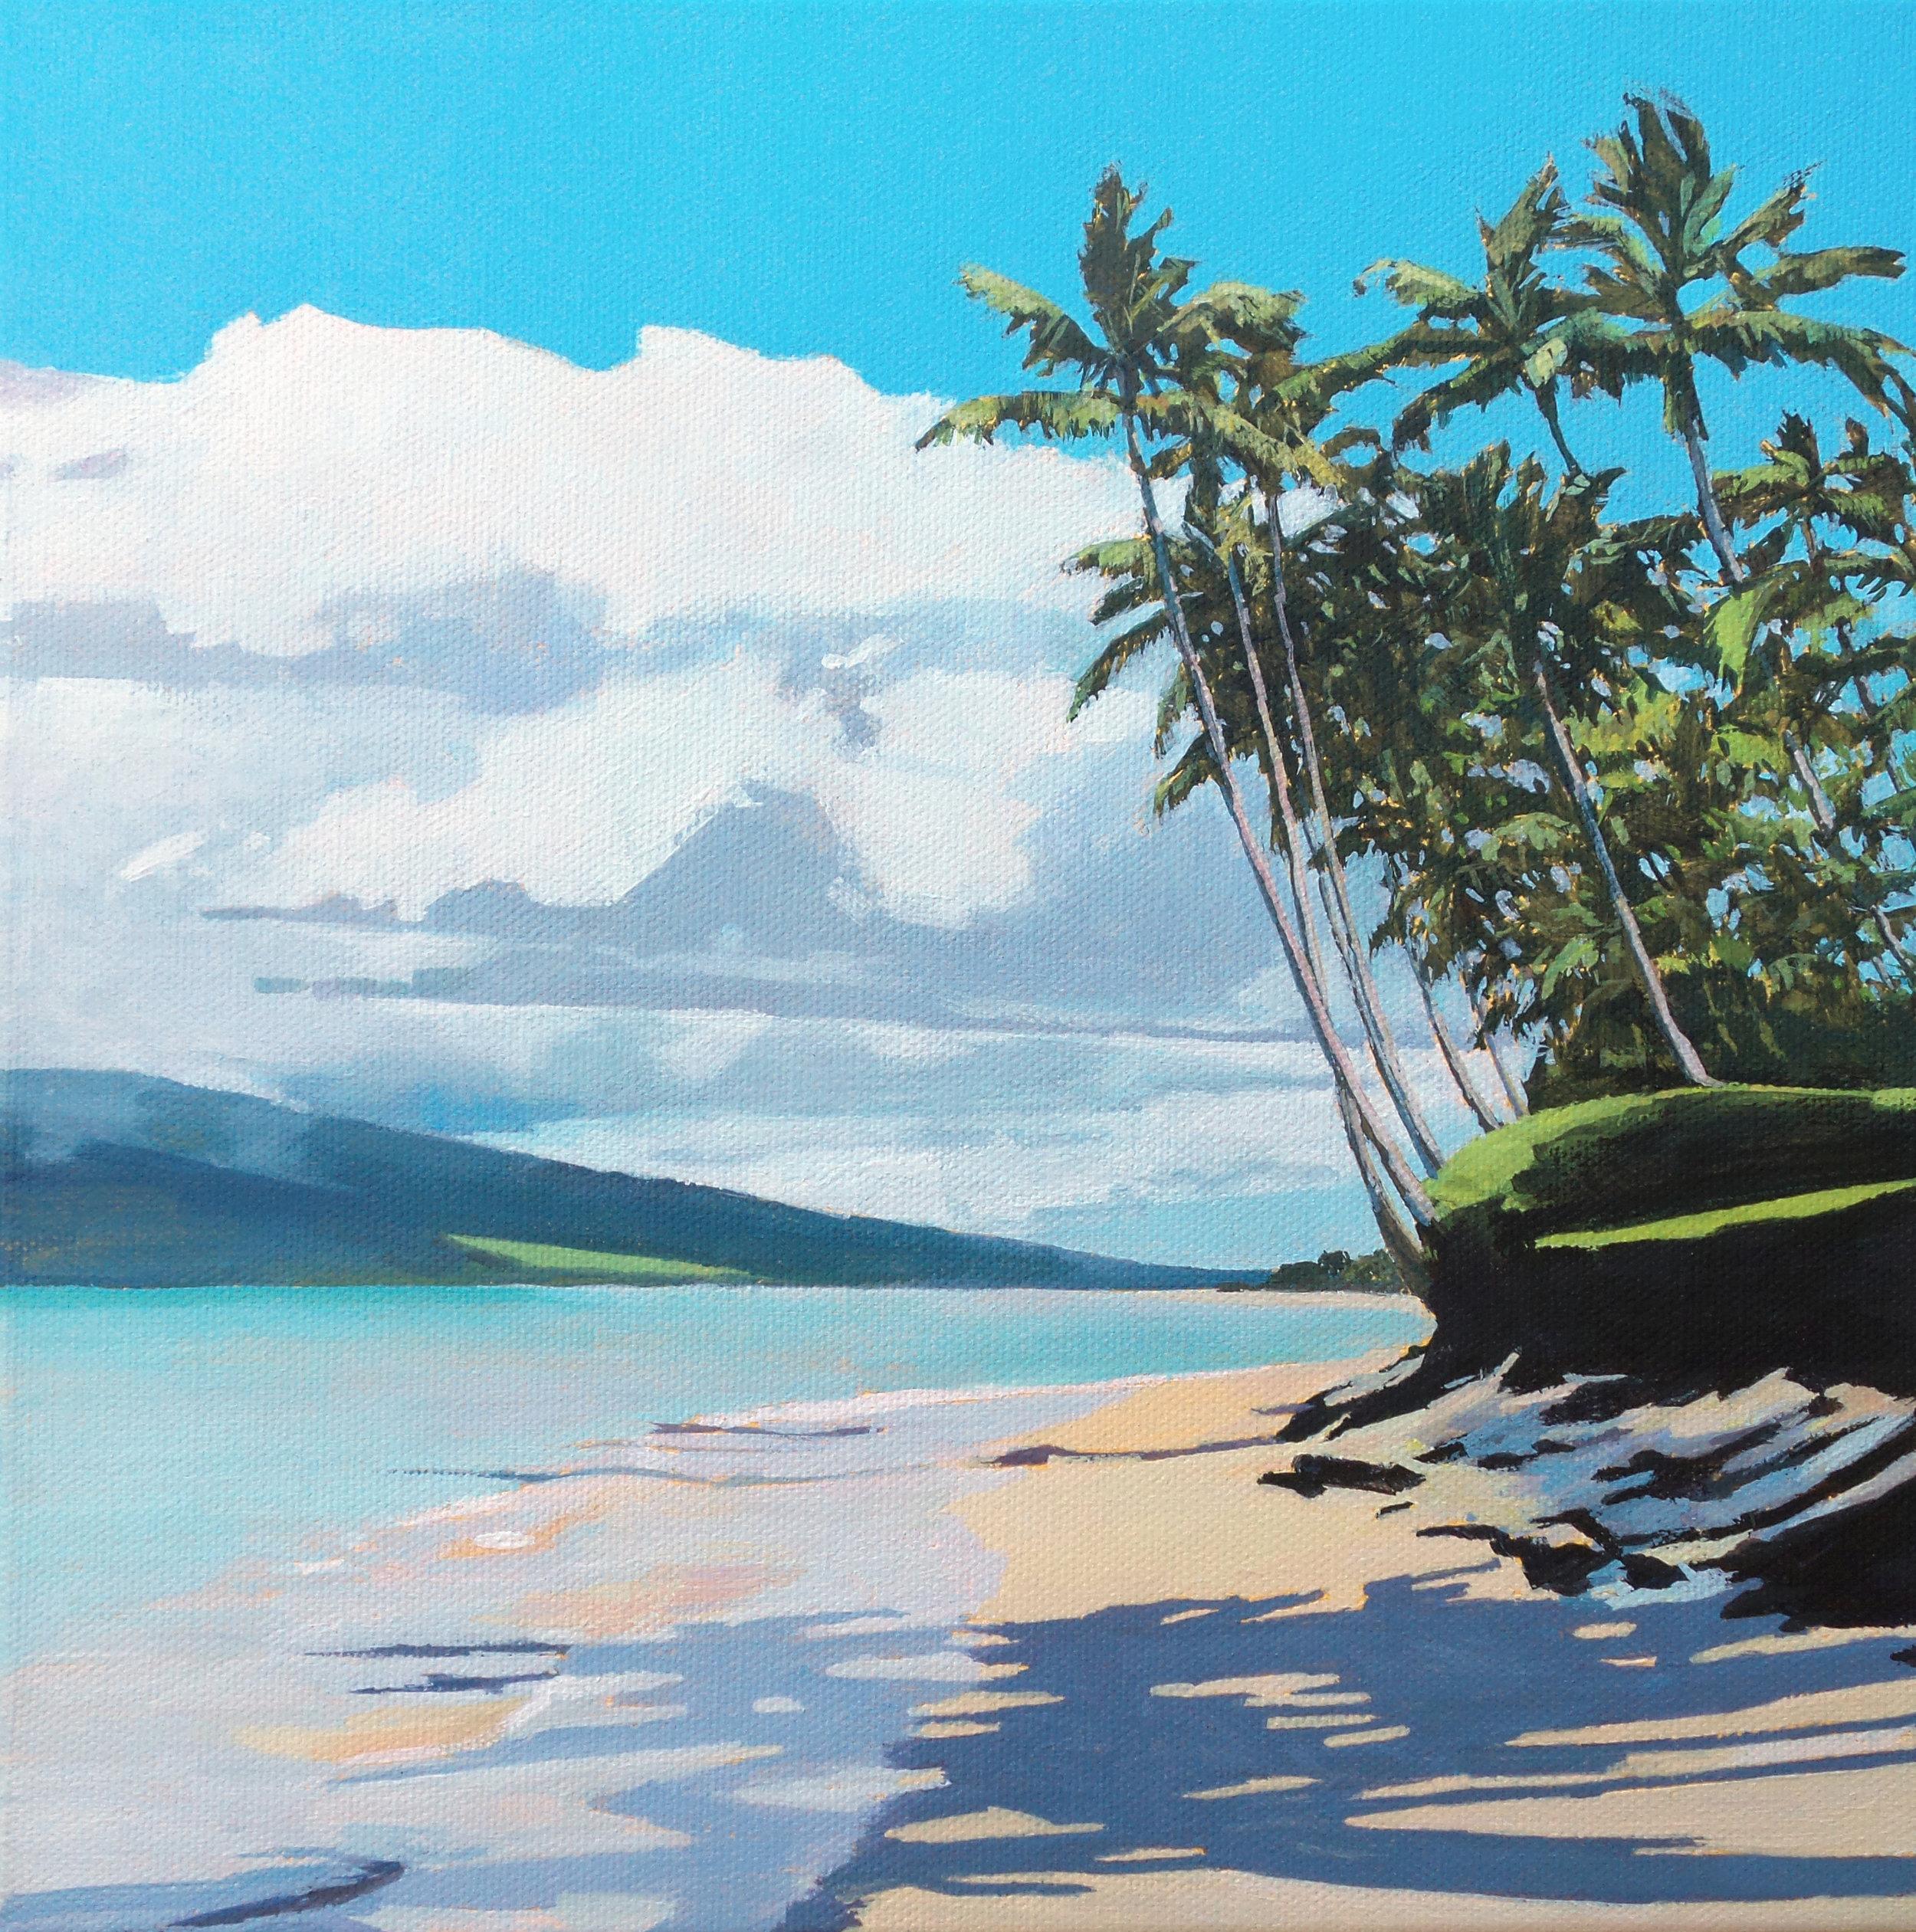 Kihei Morning Palm Shadows, Maui